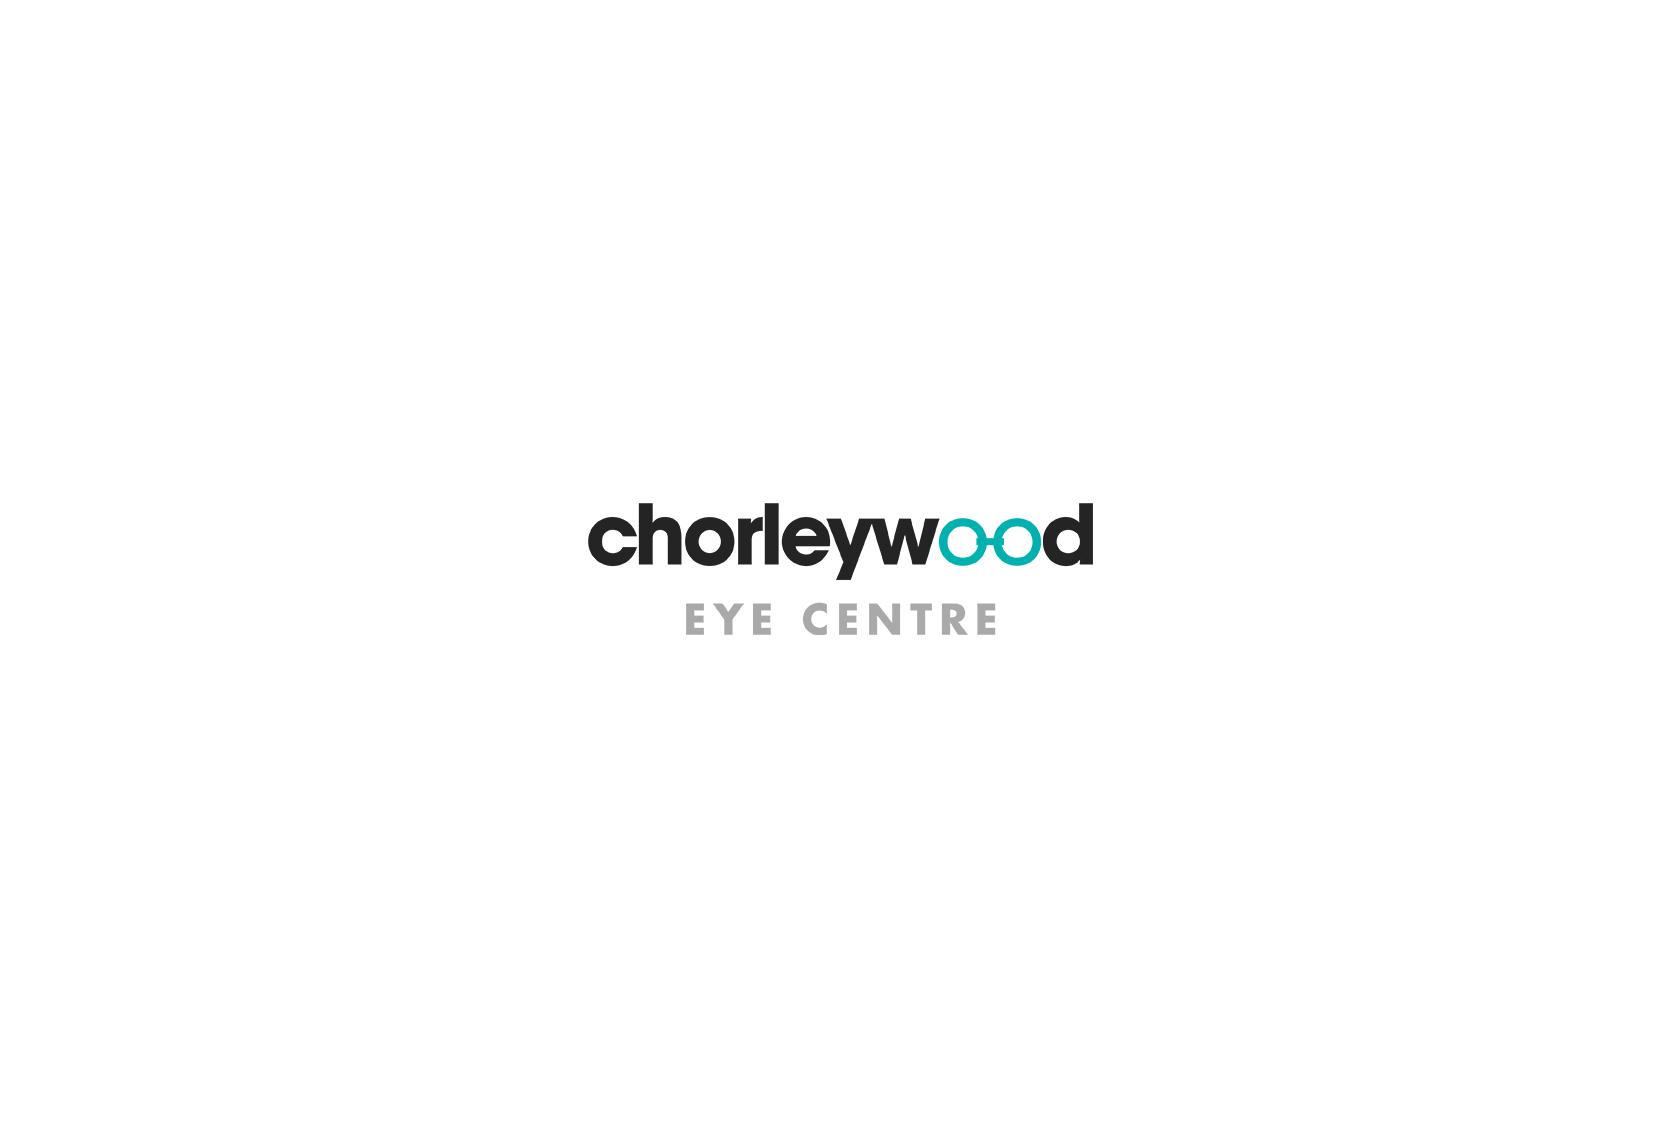 Chorleywood Portfolio - Chorleywood Eye Centre - Creative Digital